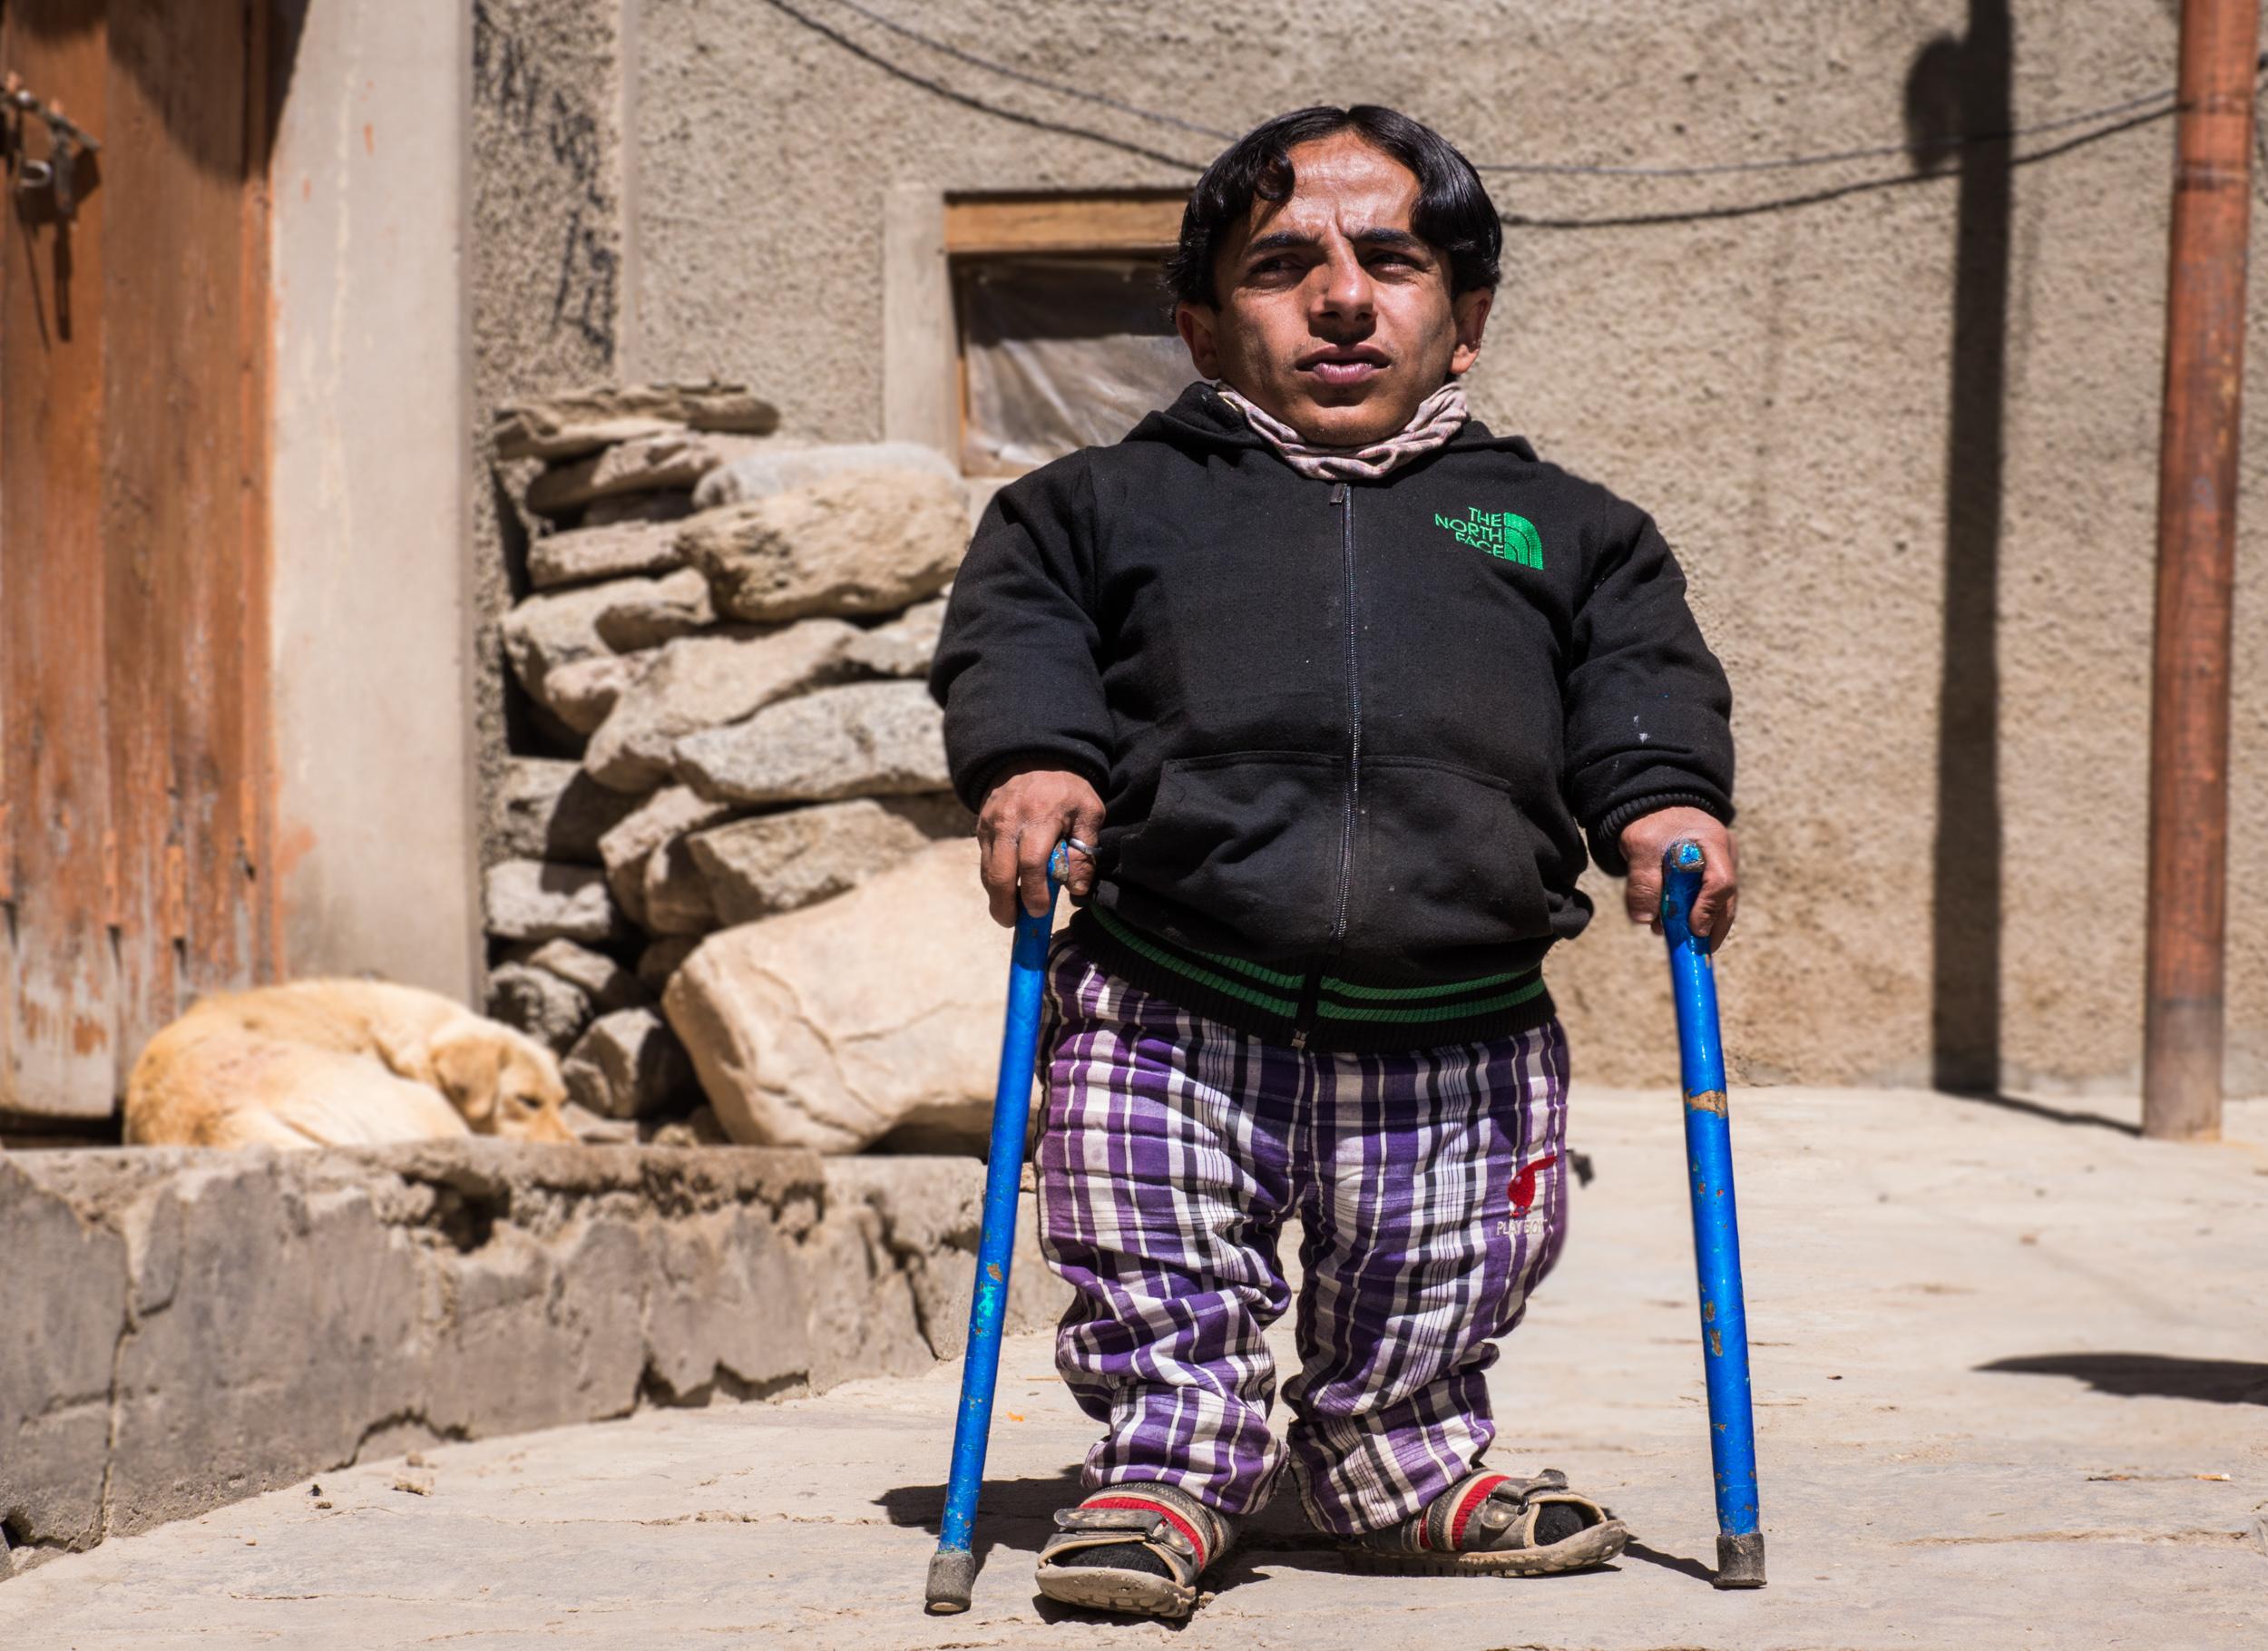 _14 Small man On sticks streets of Leh India.jpg